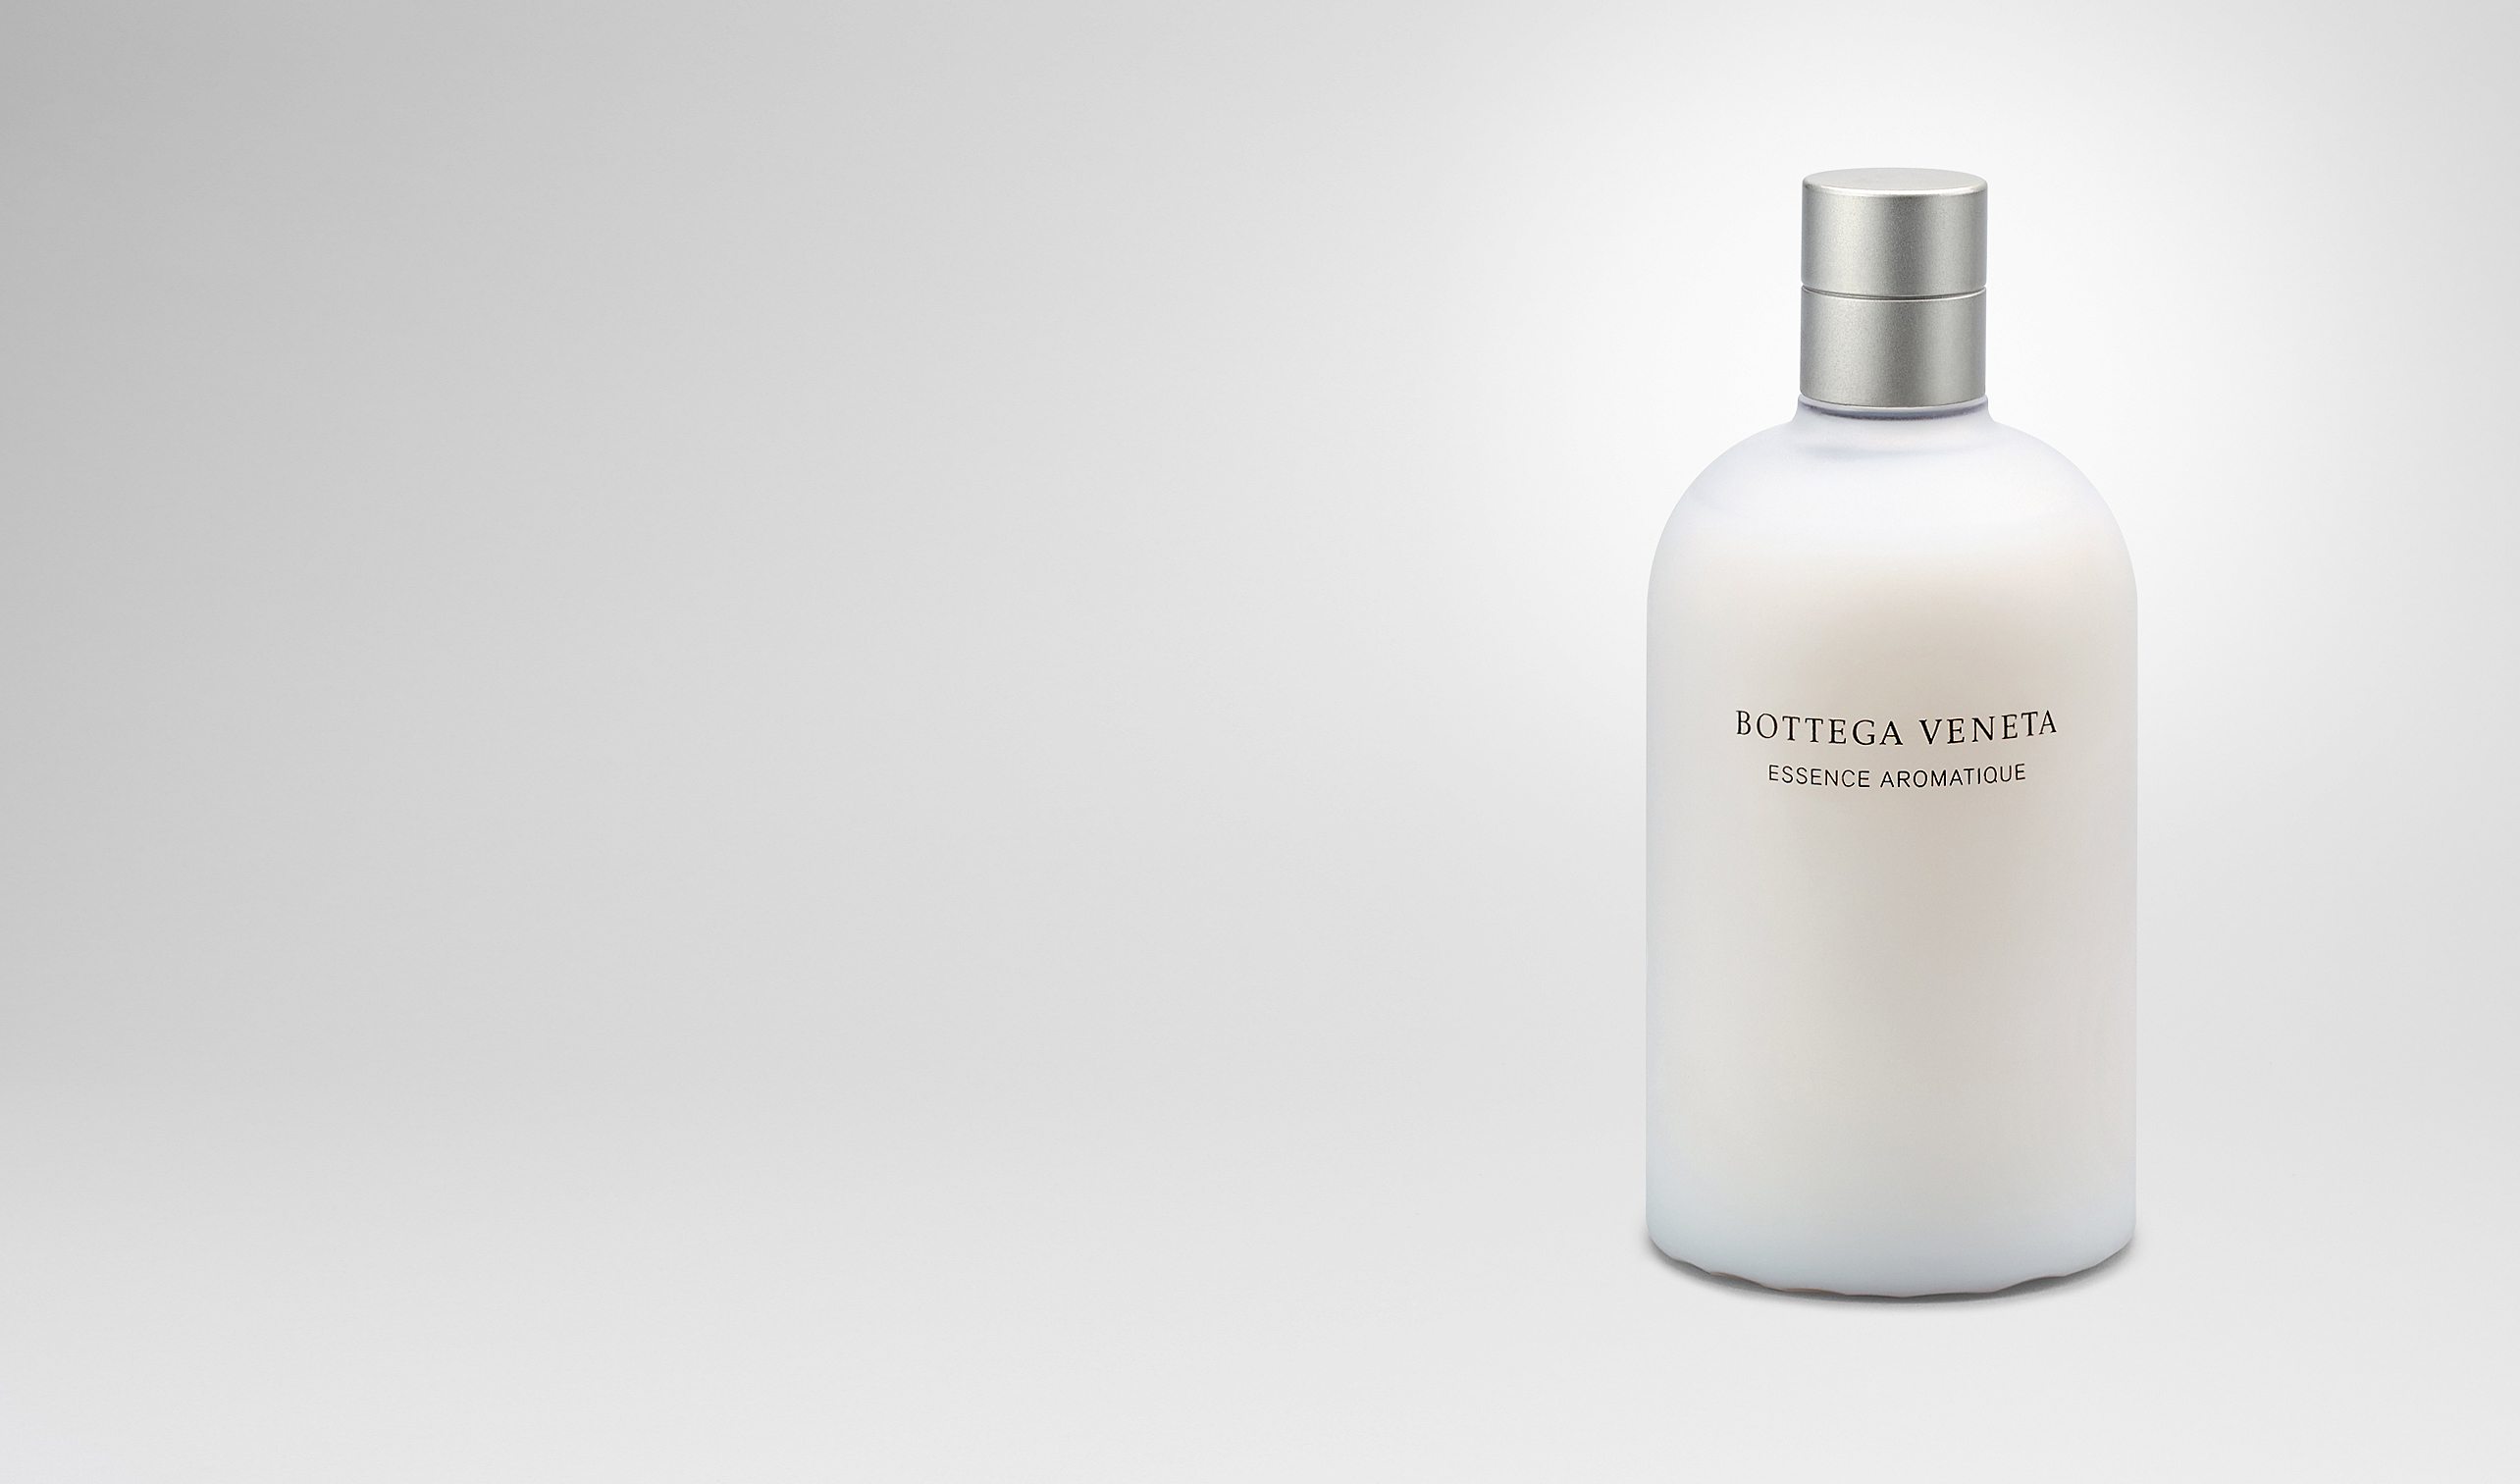 BOTTEGA VENETA Bath and Body D ESSENCE AROMATIQUE BODY LOTION 200ML pl